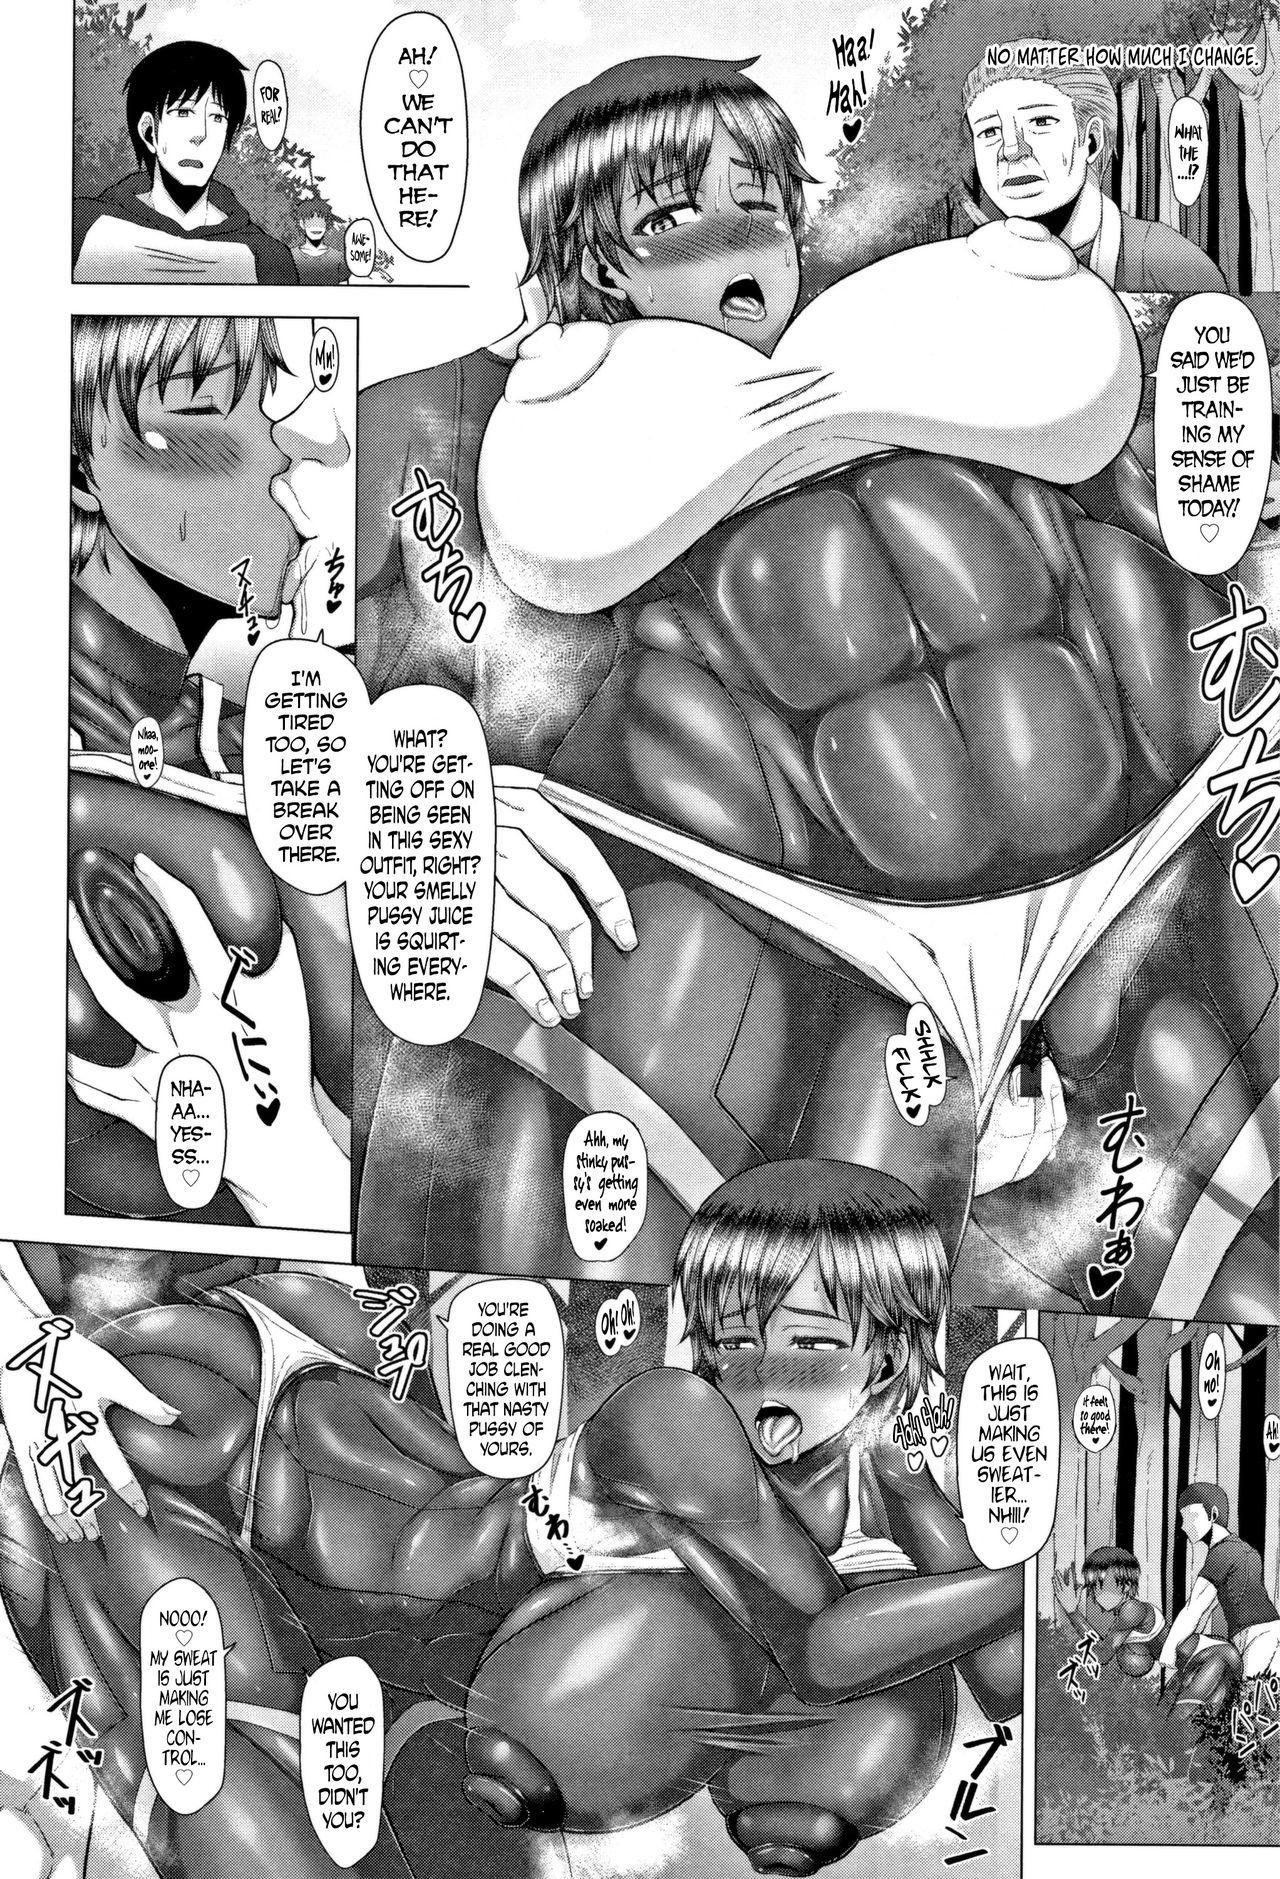 [Inoue Nanaki] Joushiki Daha! Kuro Gal Bitch-ka Seikatsu Ch. 1-3, 5-8 [English] [Dark Mac + N04h] 33